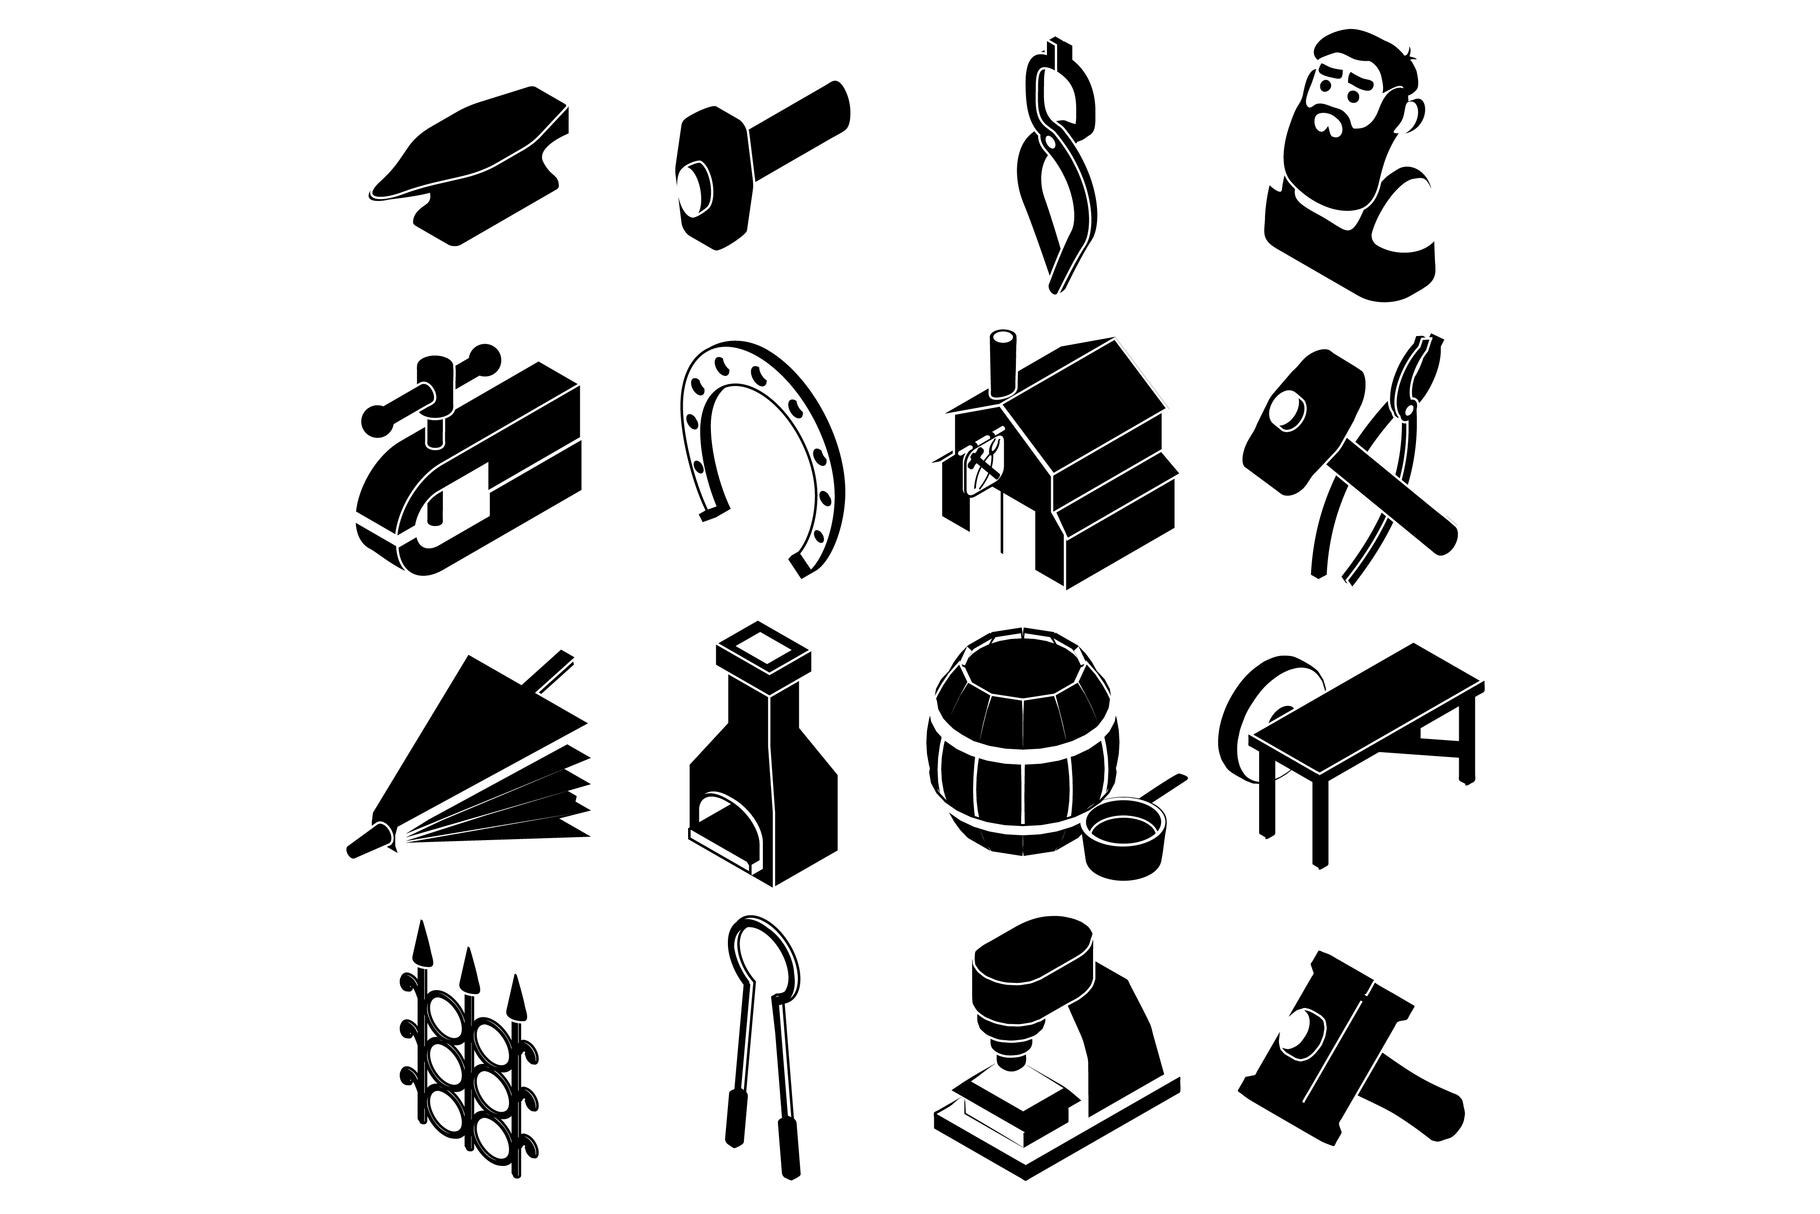 Blacksmith tools icons set, simple style example image 1